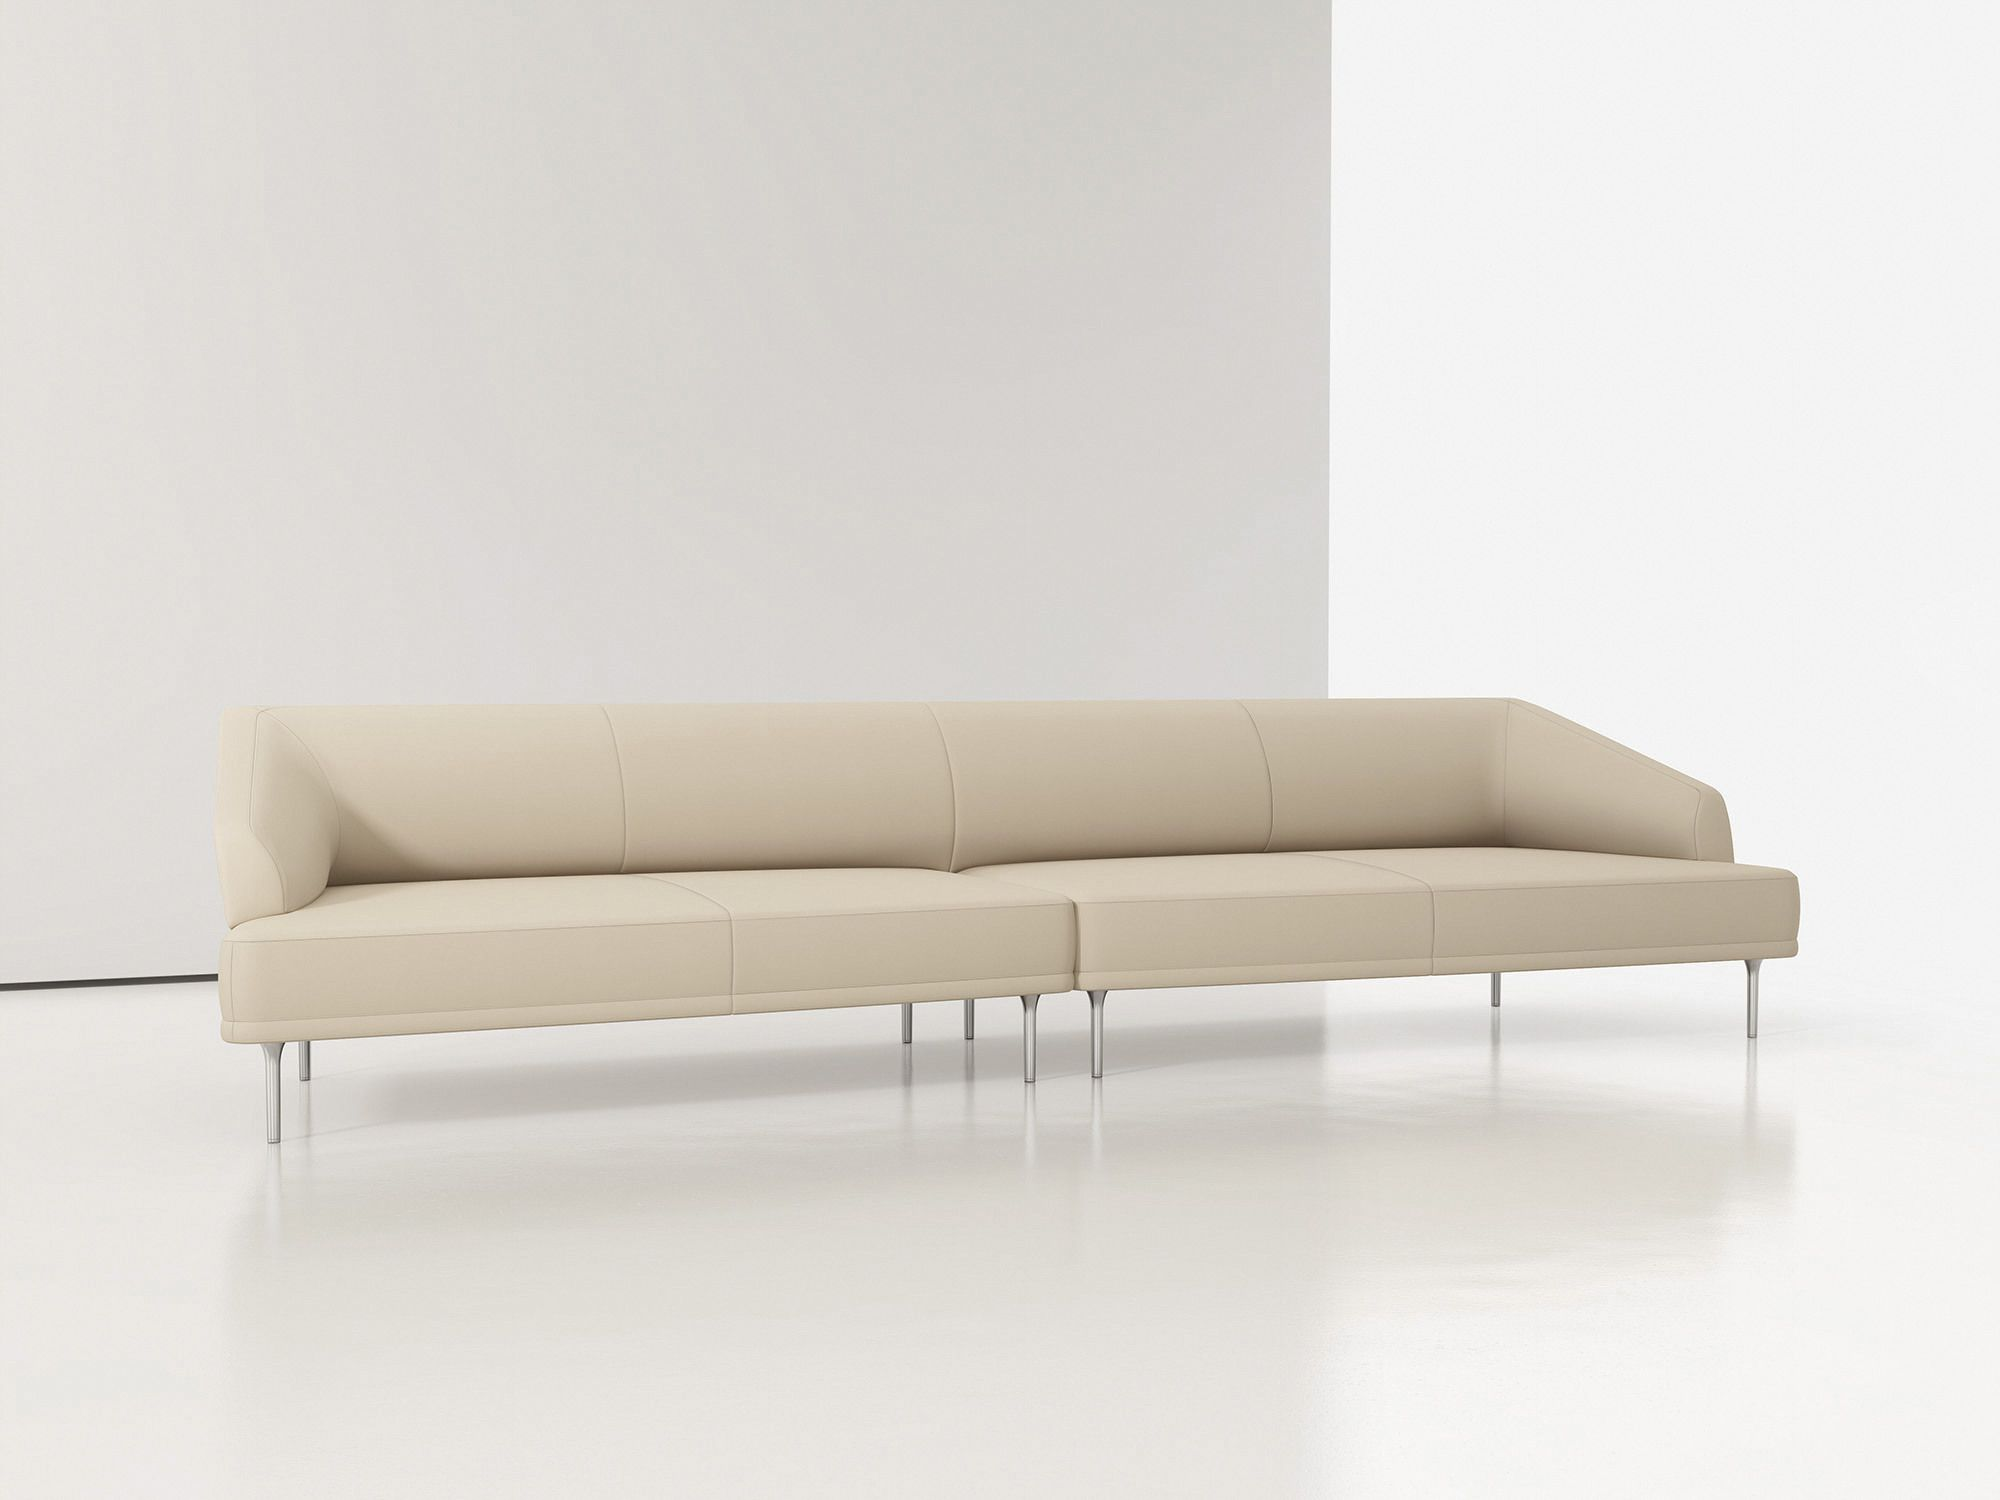 Calligaris METRO SOFA Modern Furniture Store in Fort Lauderdale Florida Living Room Looks Pinterest